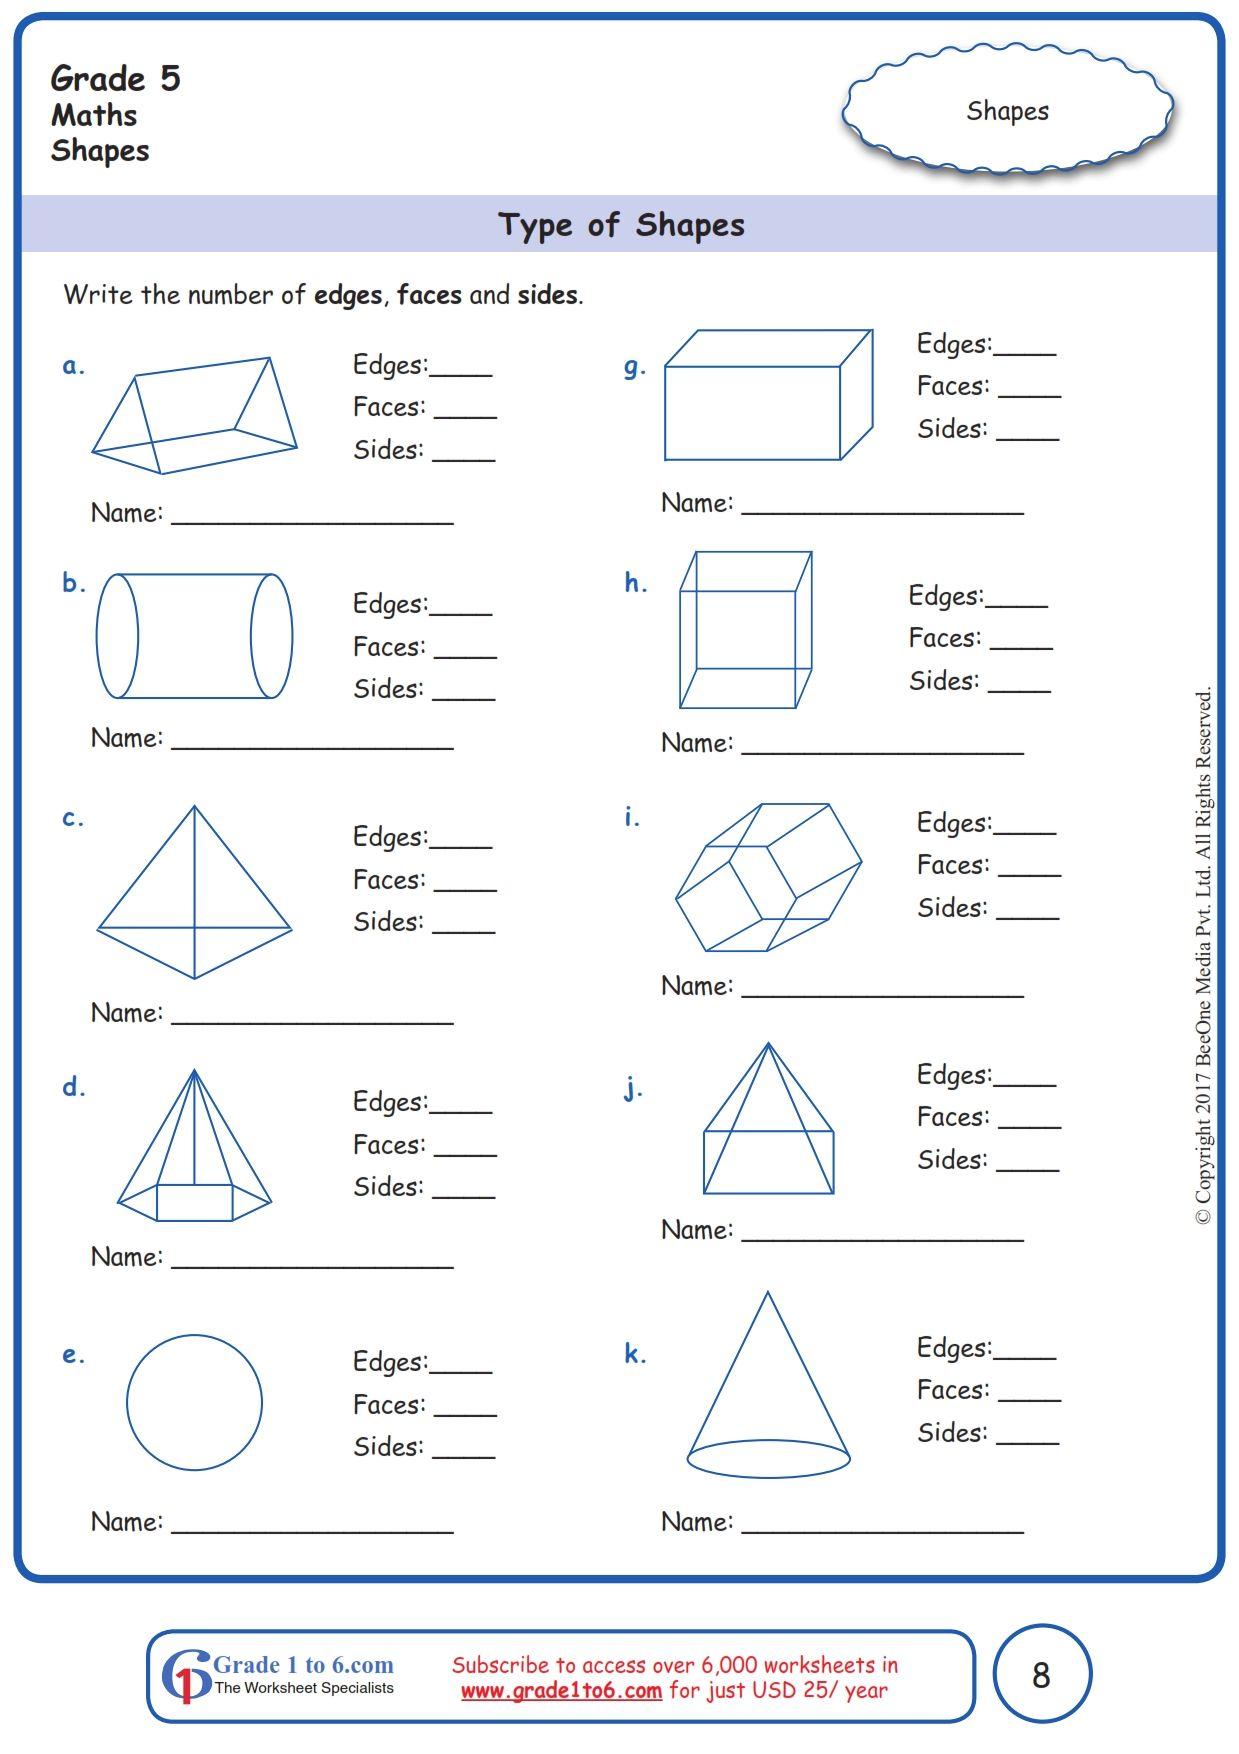 Worksheet Grade 5 Math Type of Shapes in 2020 Grade 5